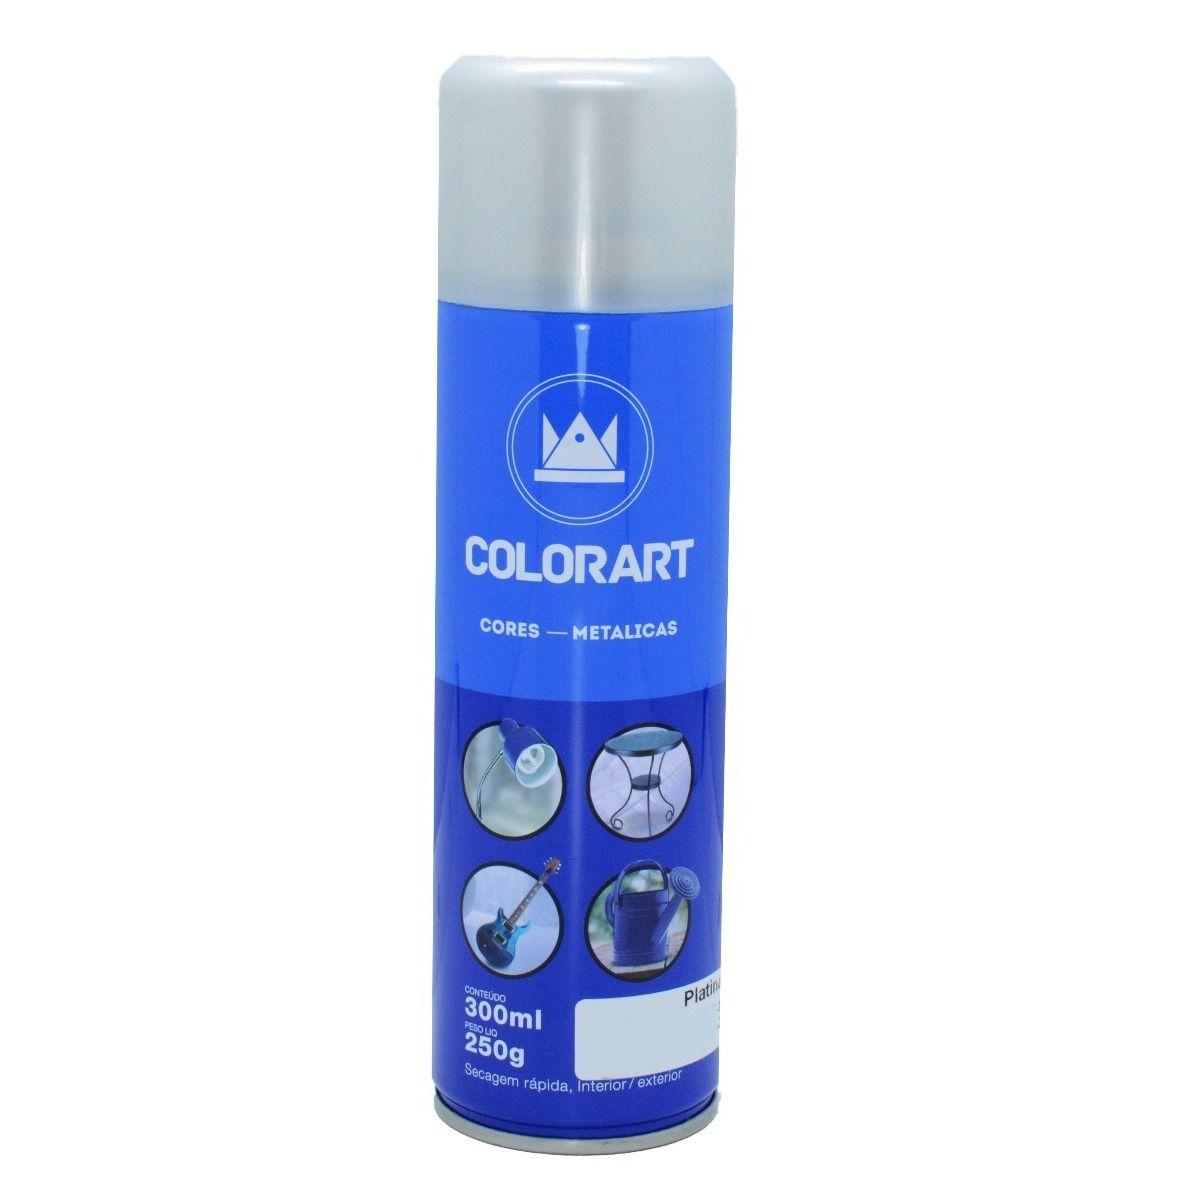 Tinta Spray Cores Metálicas Colorart Platina  - Rea Comércio - Sua Loja Completa!